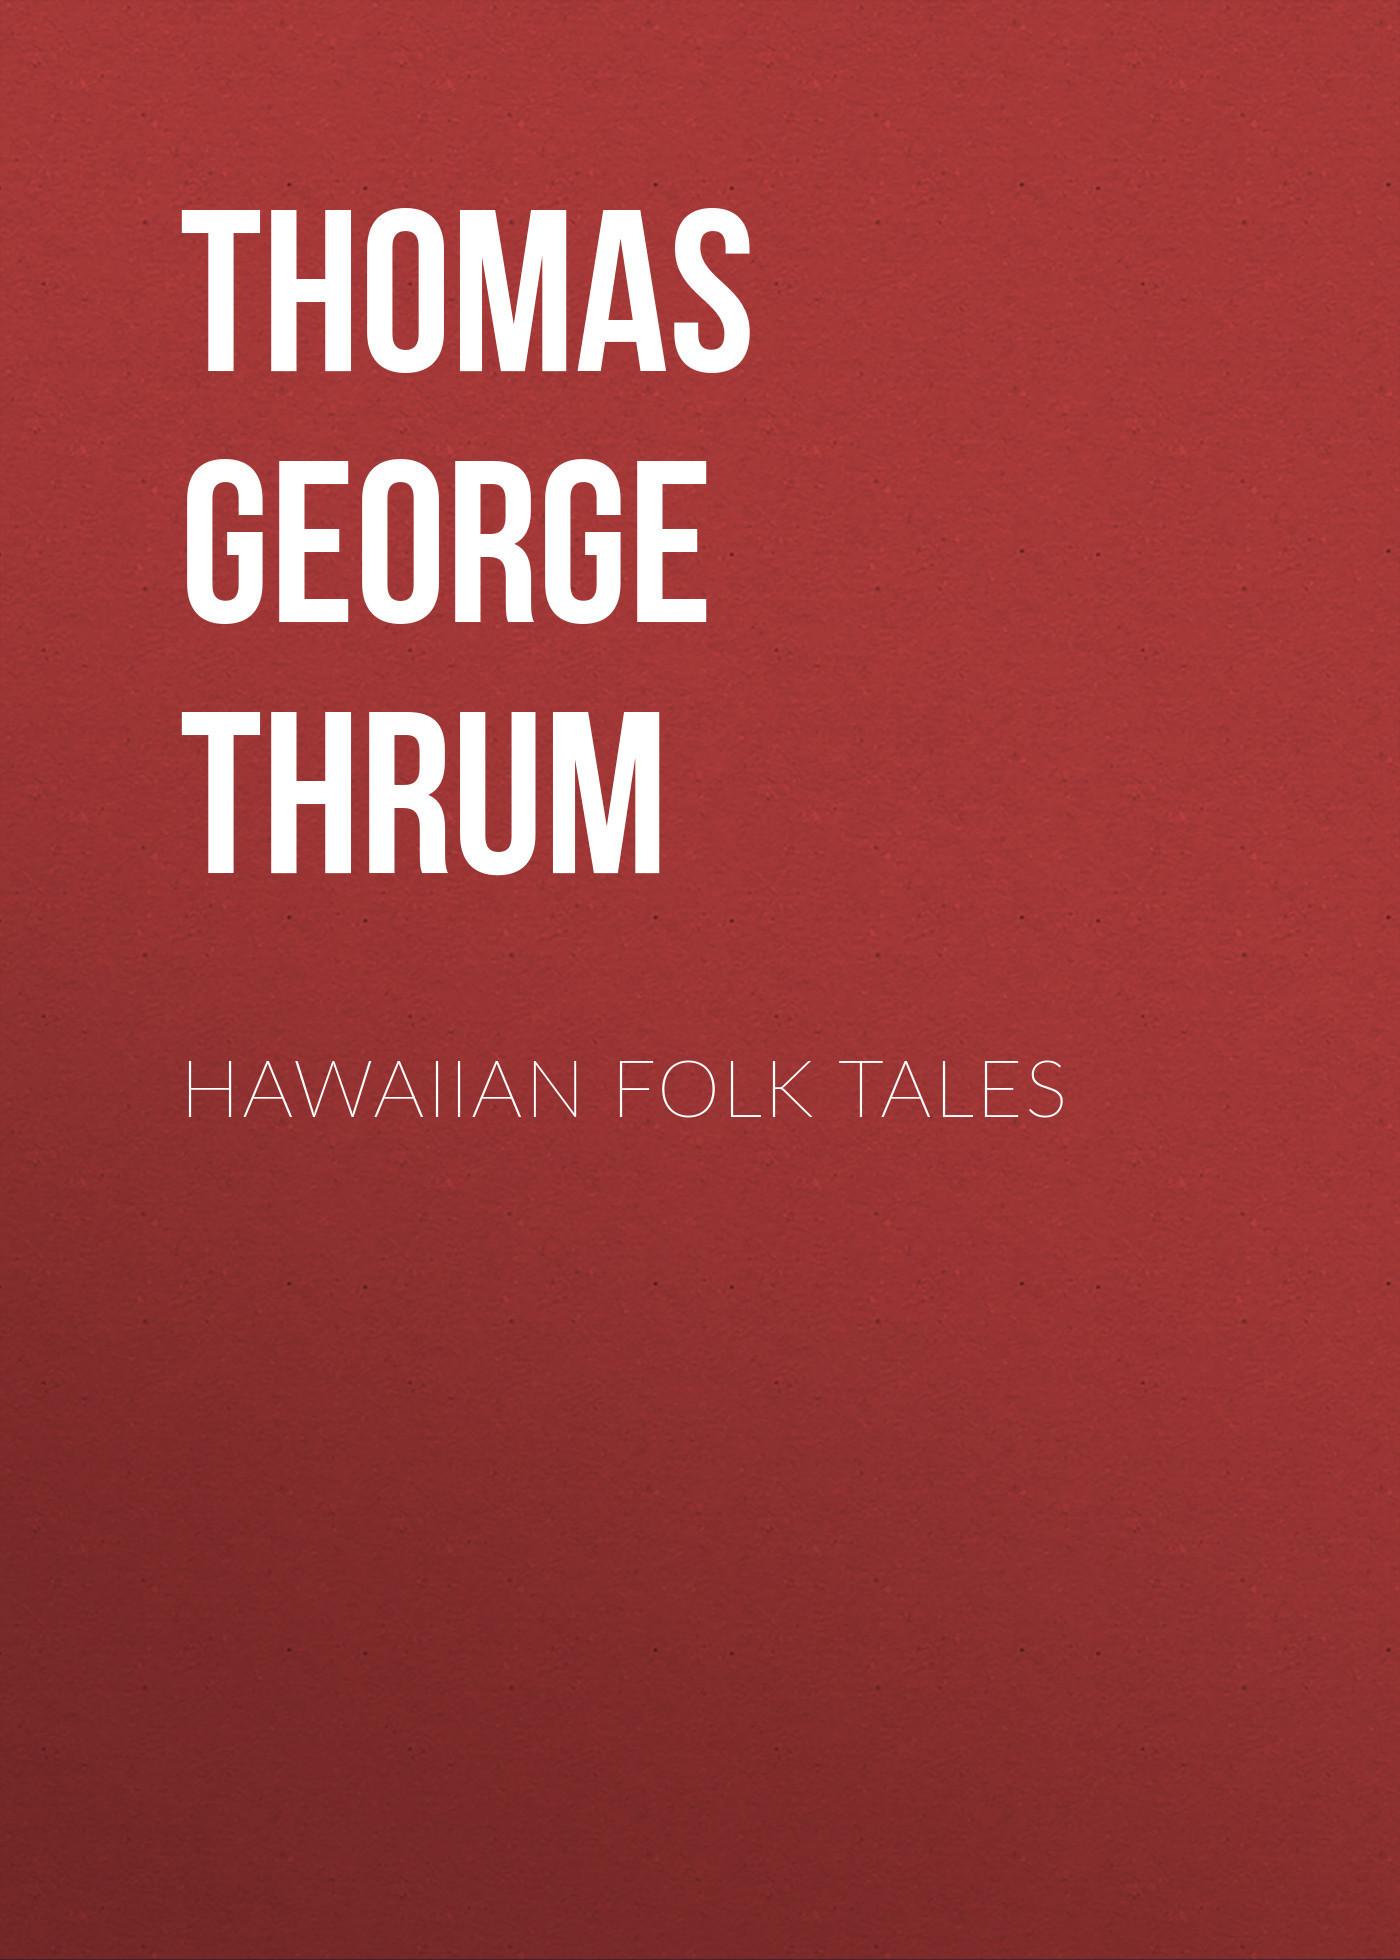 Thomas George Thrum Hawaiian Folk Tales